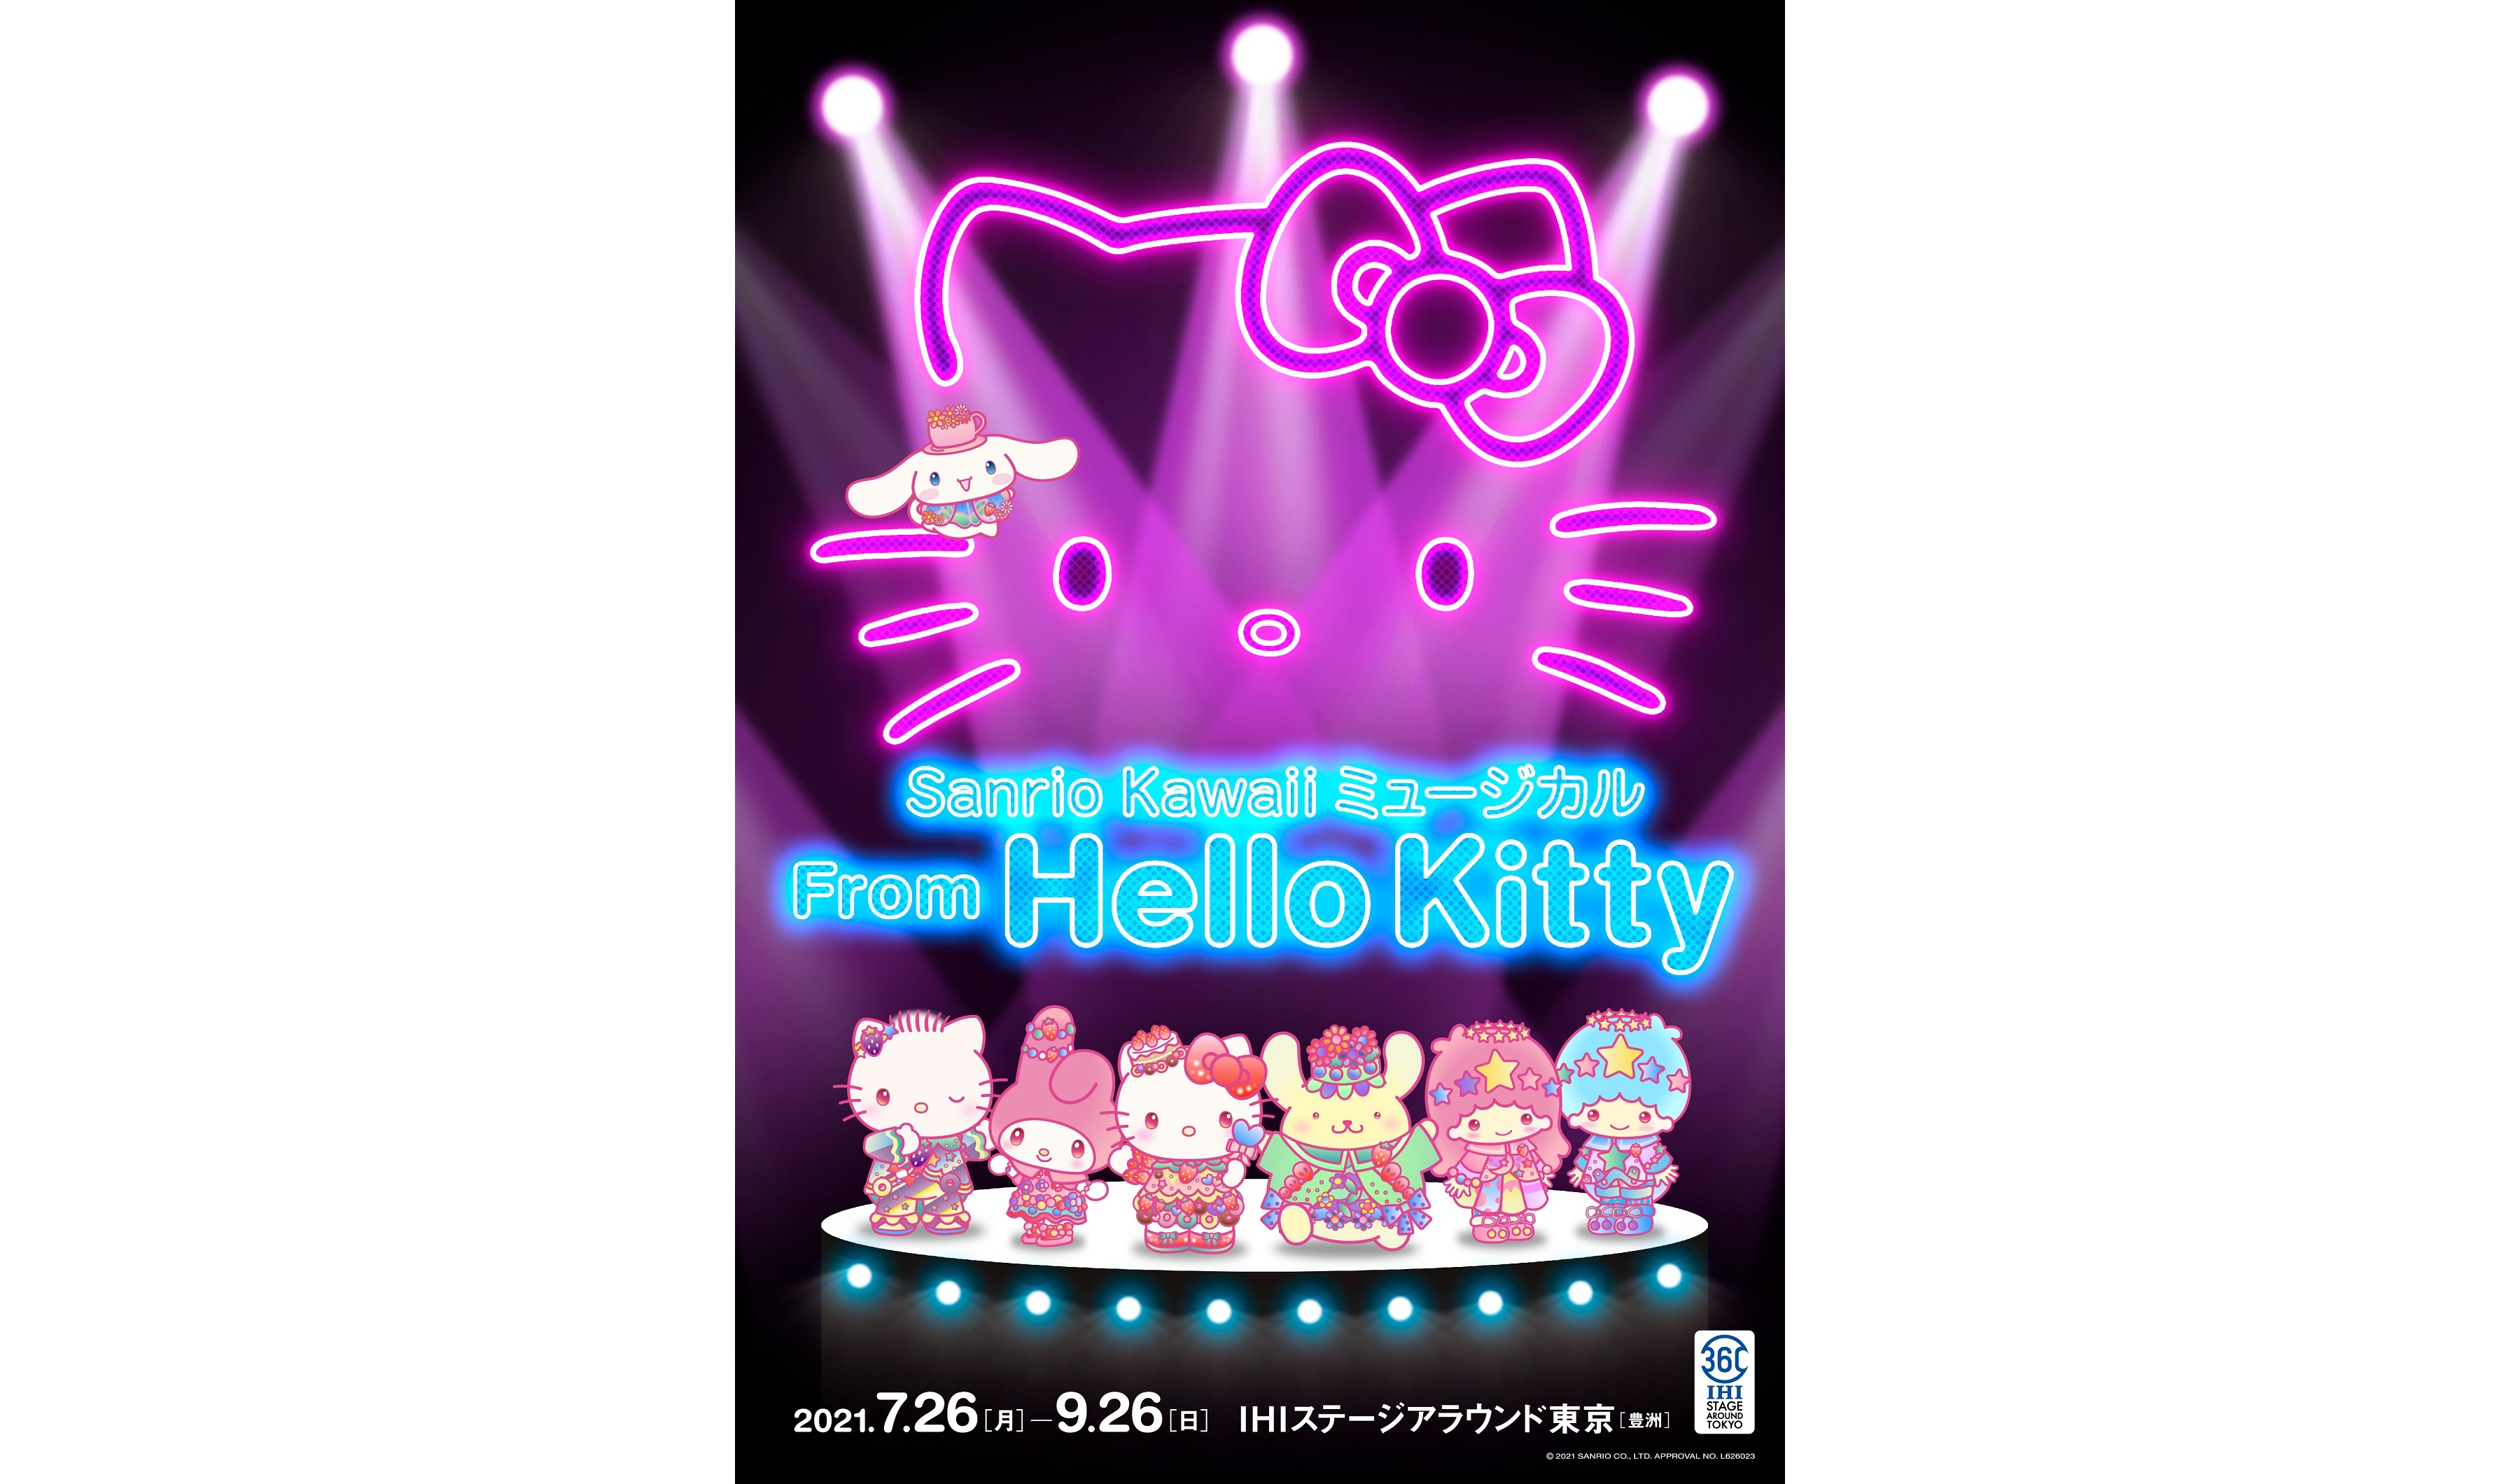 Sanrio Kawaii ミュージカル『From Hello Kitty』1